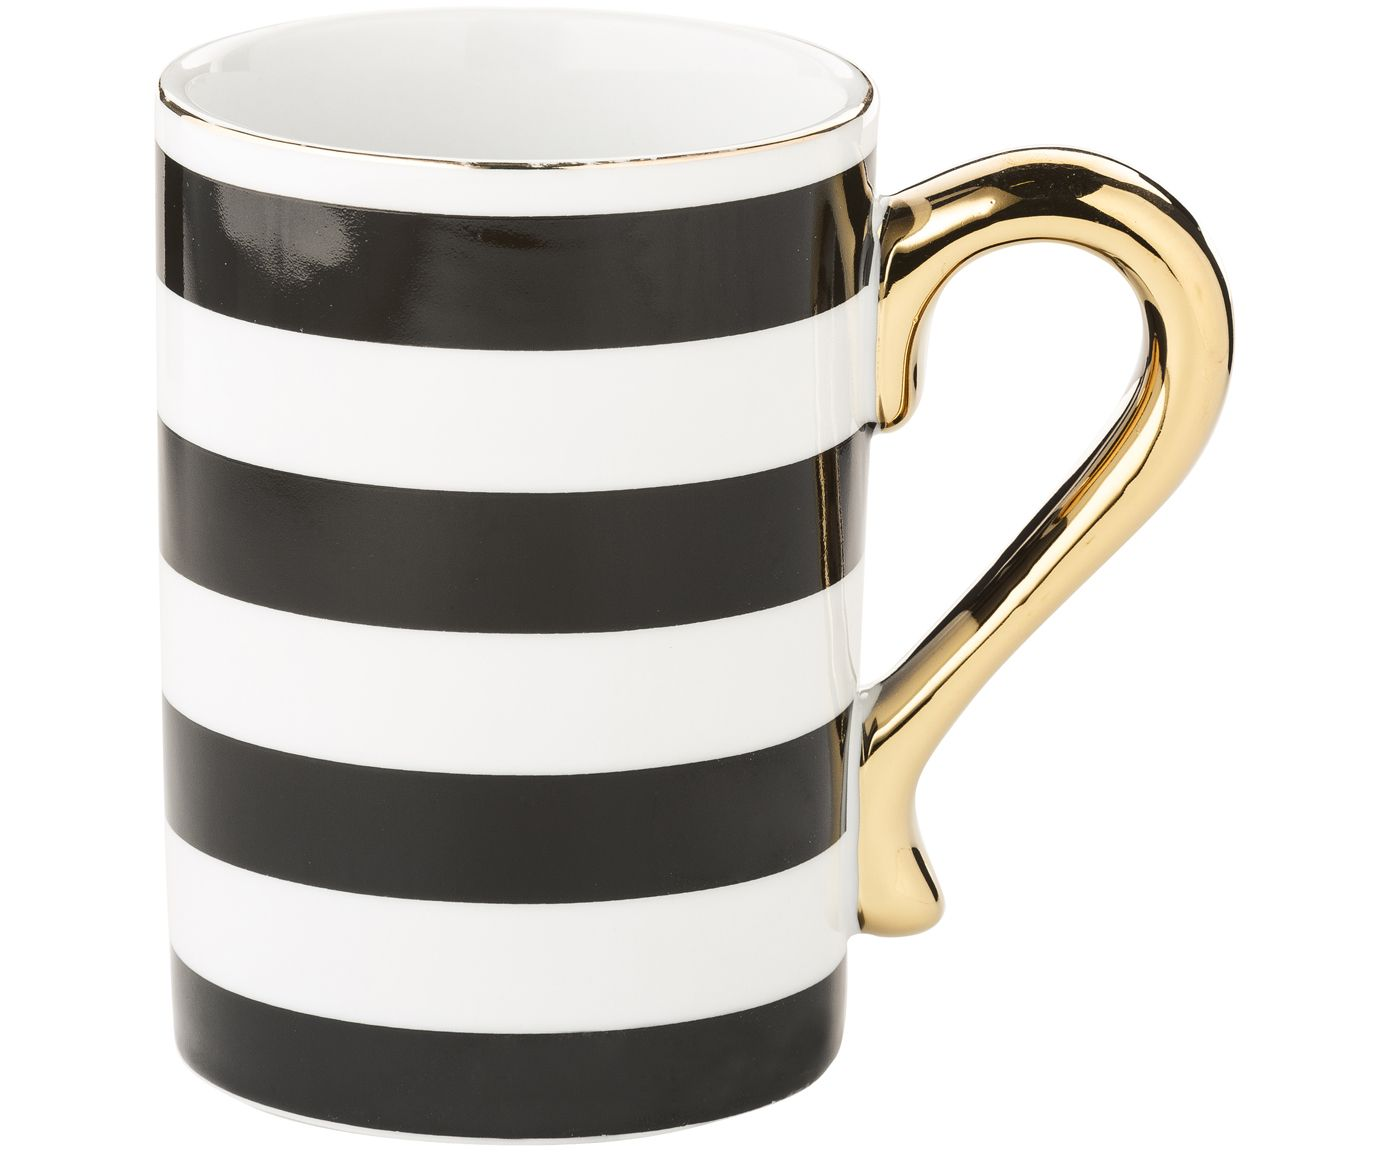 Tasse Stripes Nordic Design Kitchen Glassware Tableware